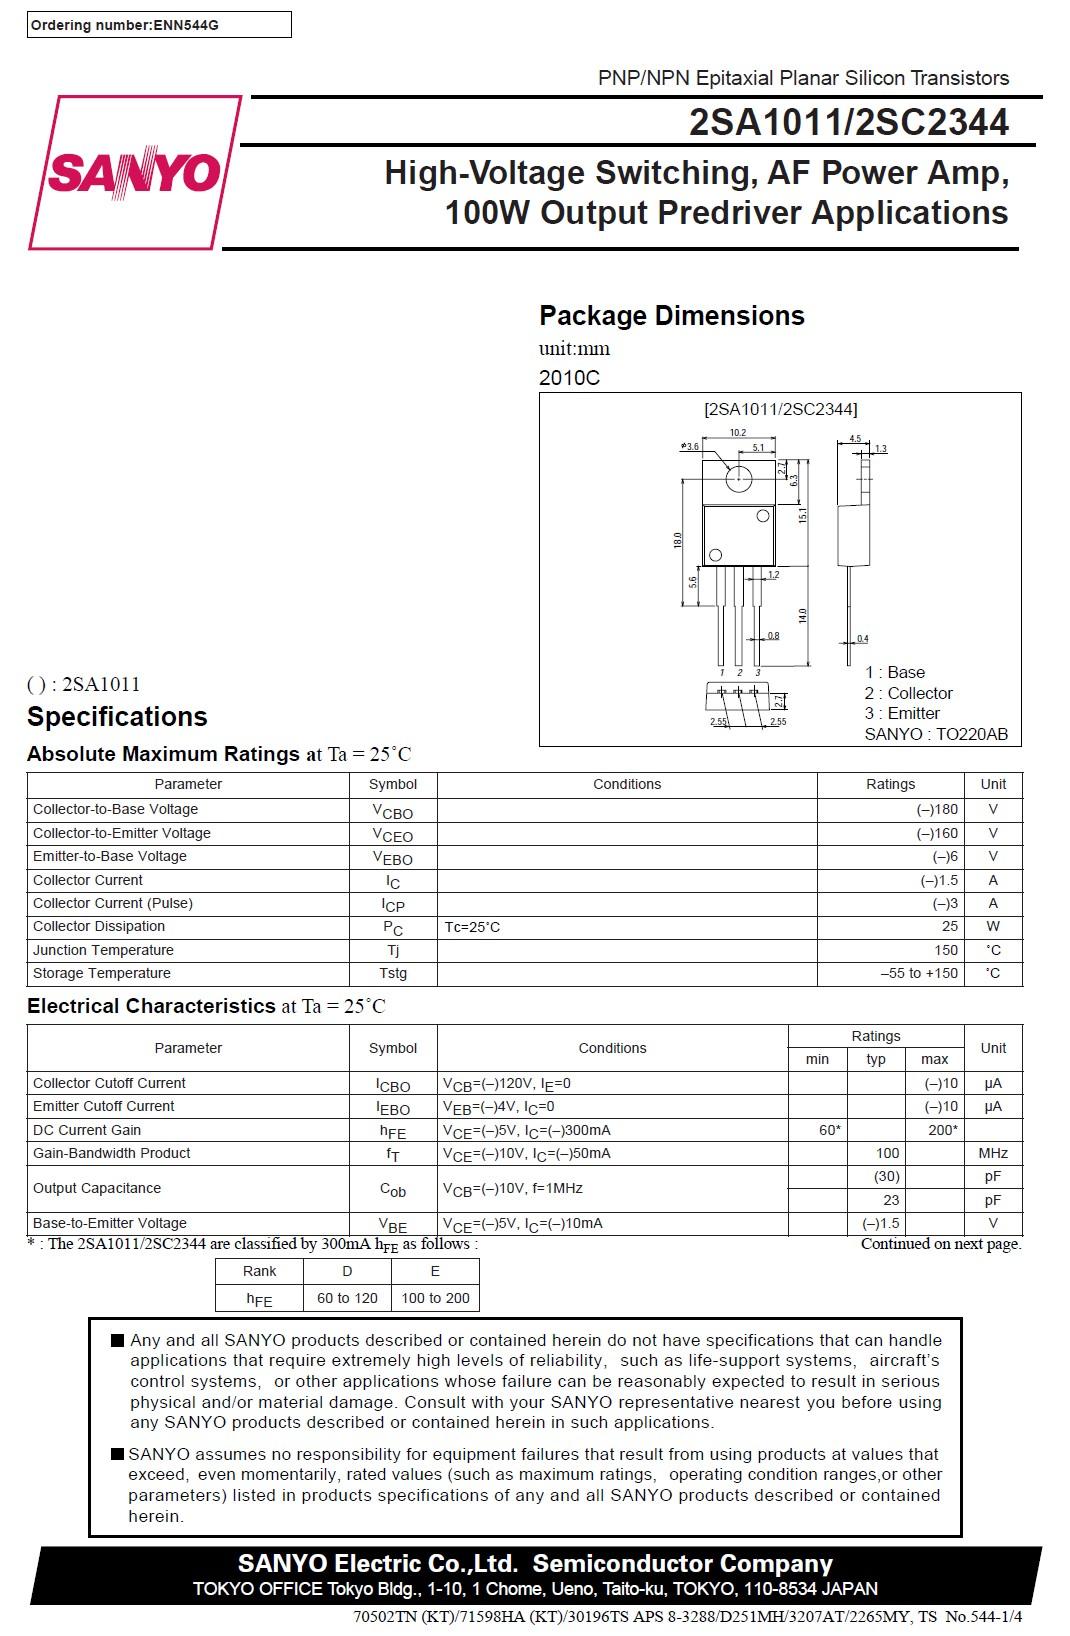 Tranzisztor PNP 180V 1.5A 25W 100MHzNF/SL 2SA1011 2SA1011 -